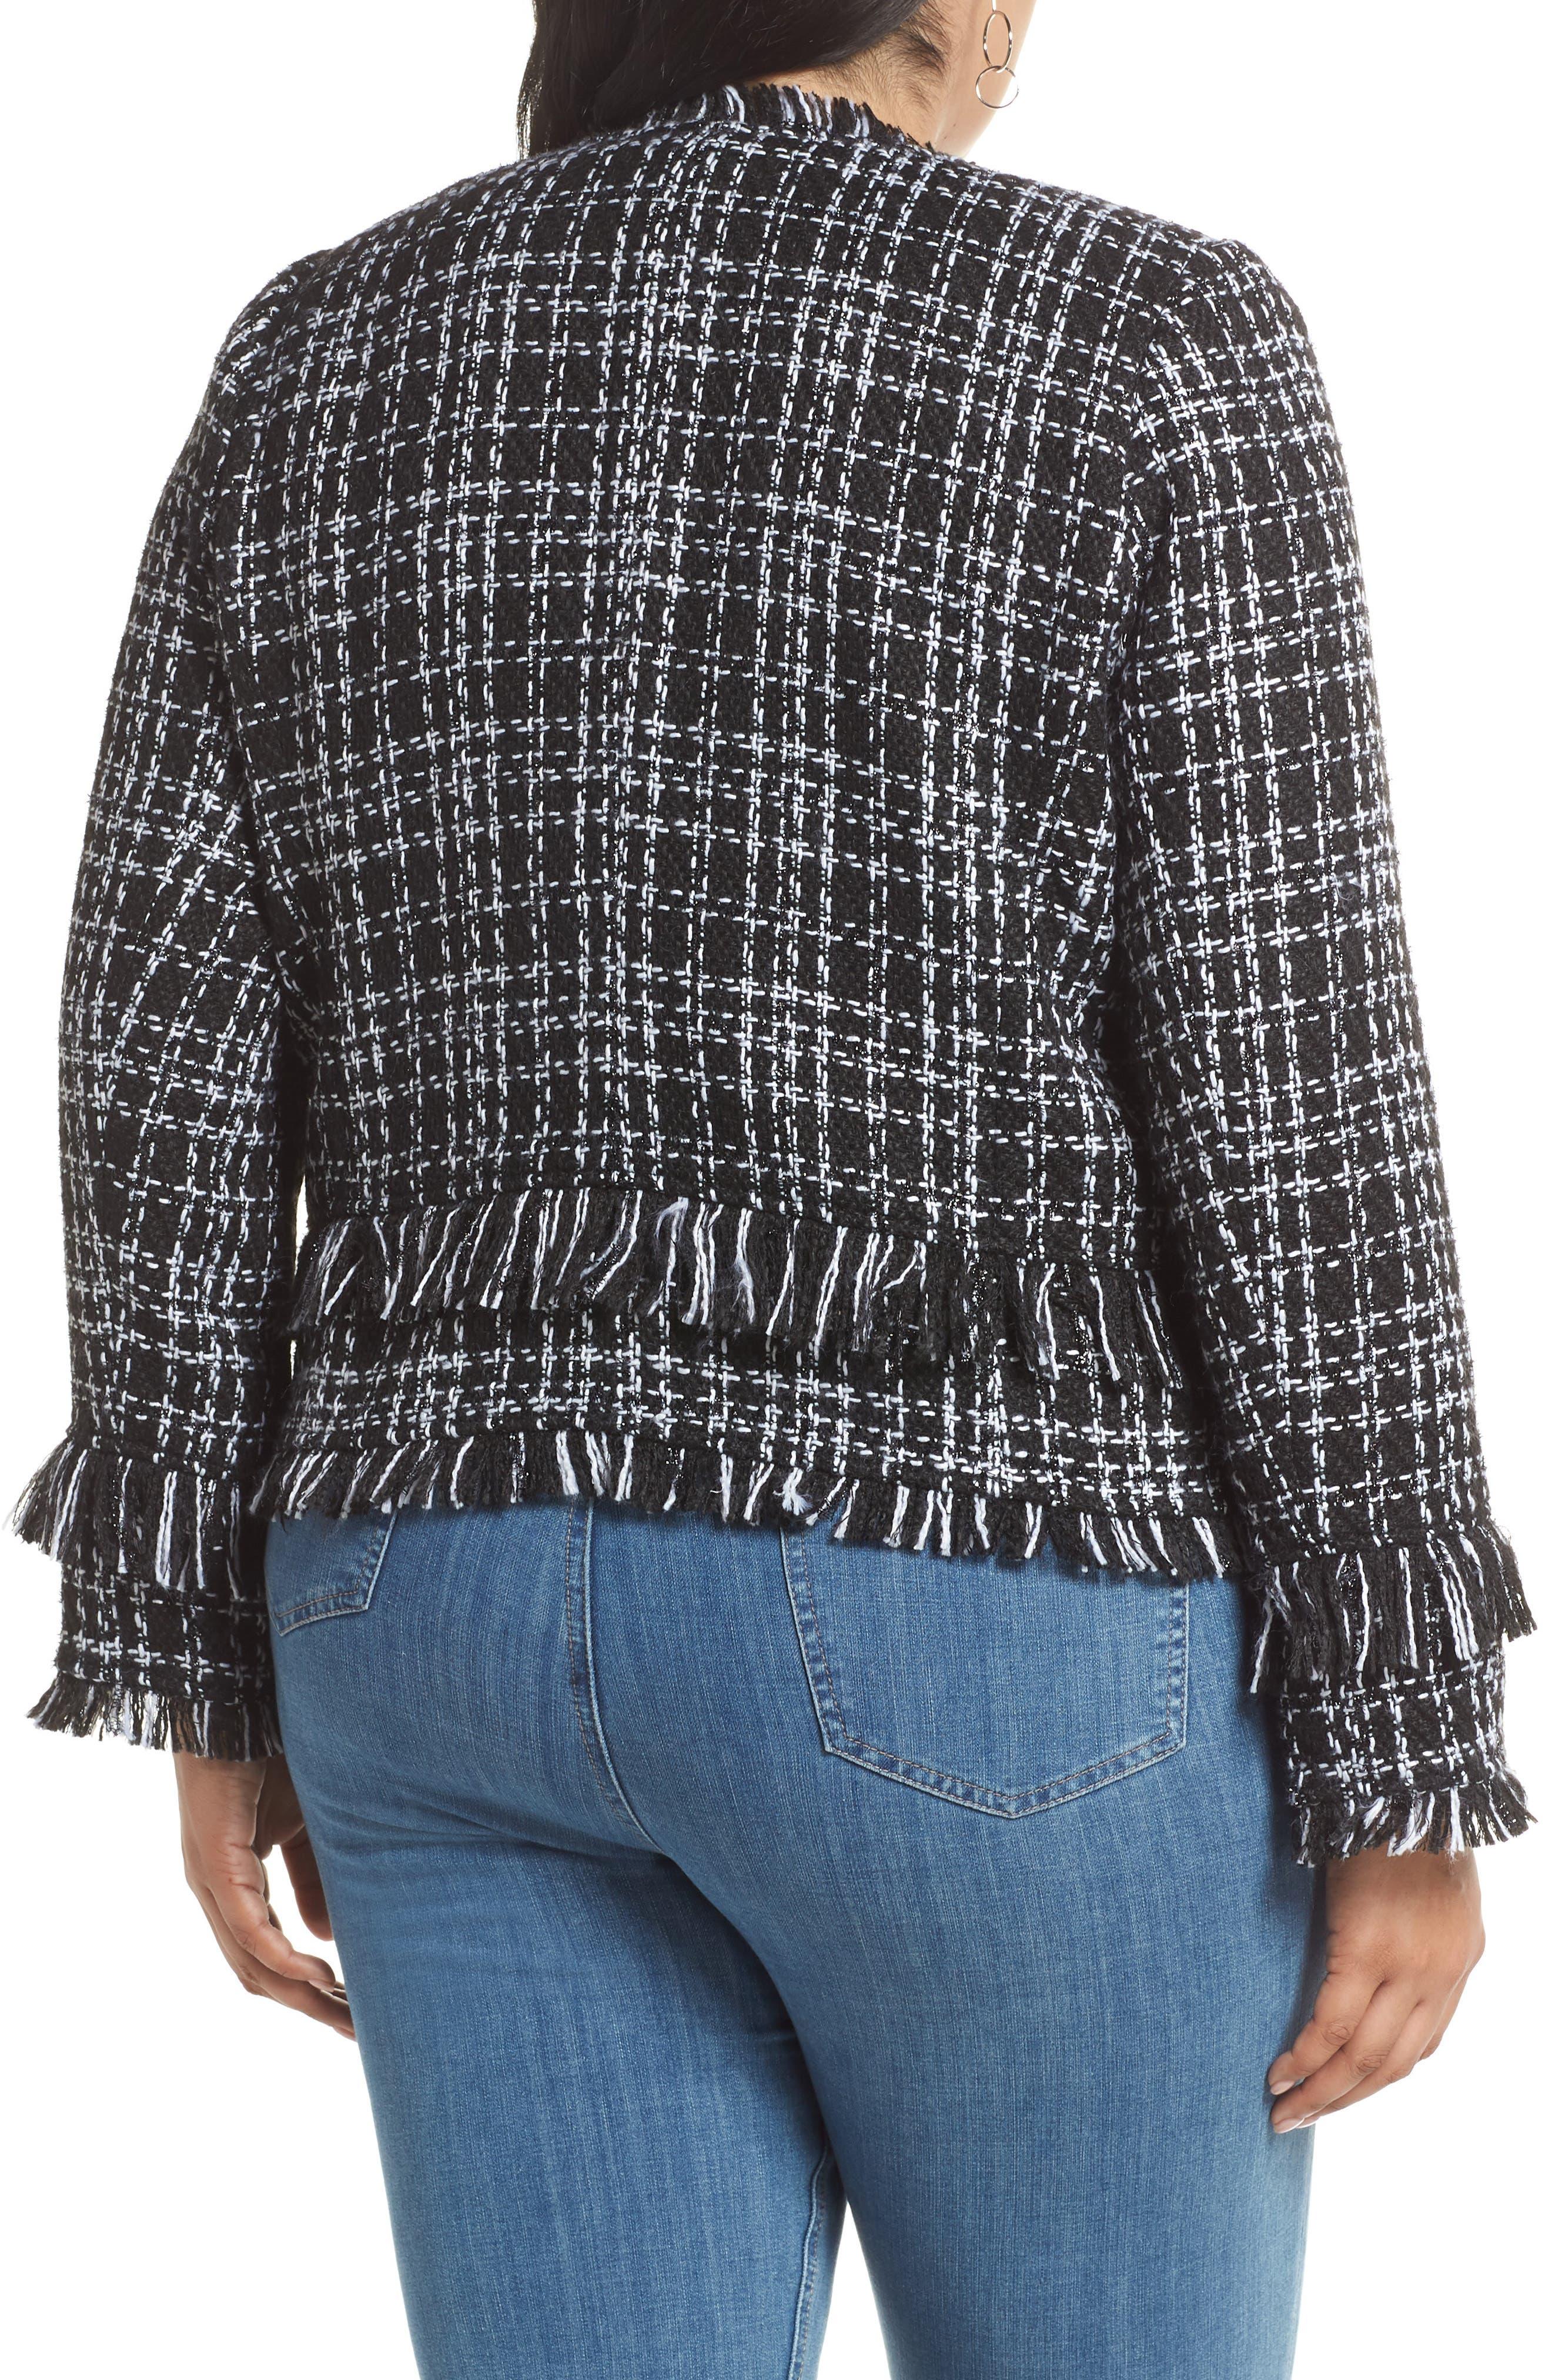 HALOGEN<SUP>®</SUP>, Tweed Fringe Jacket, Alternate thumbnail 2, color, BLACK- WHITE TWEED